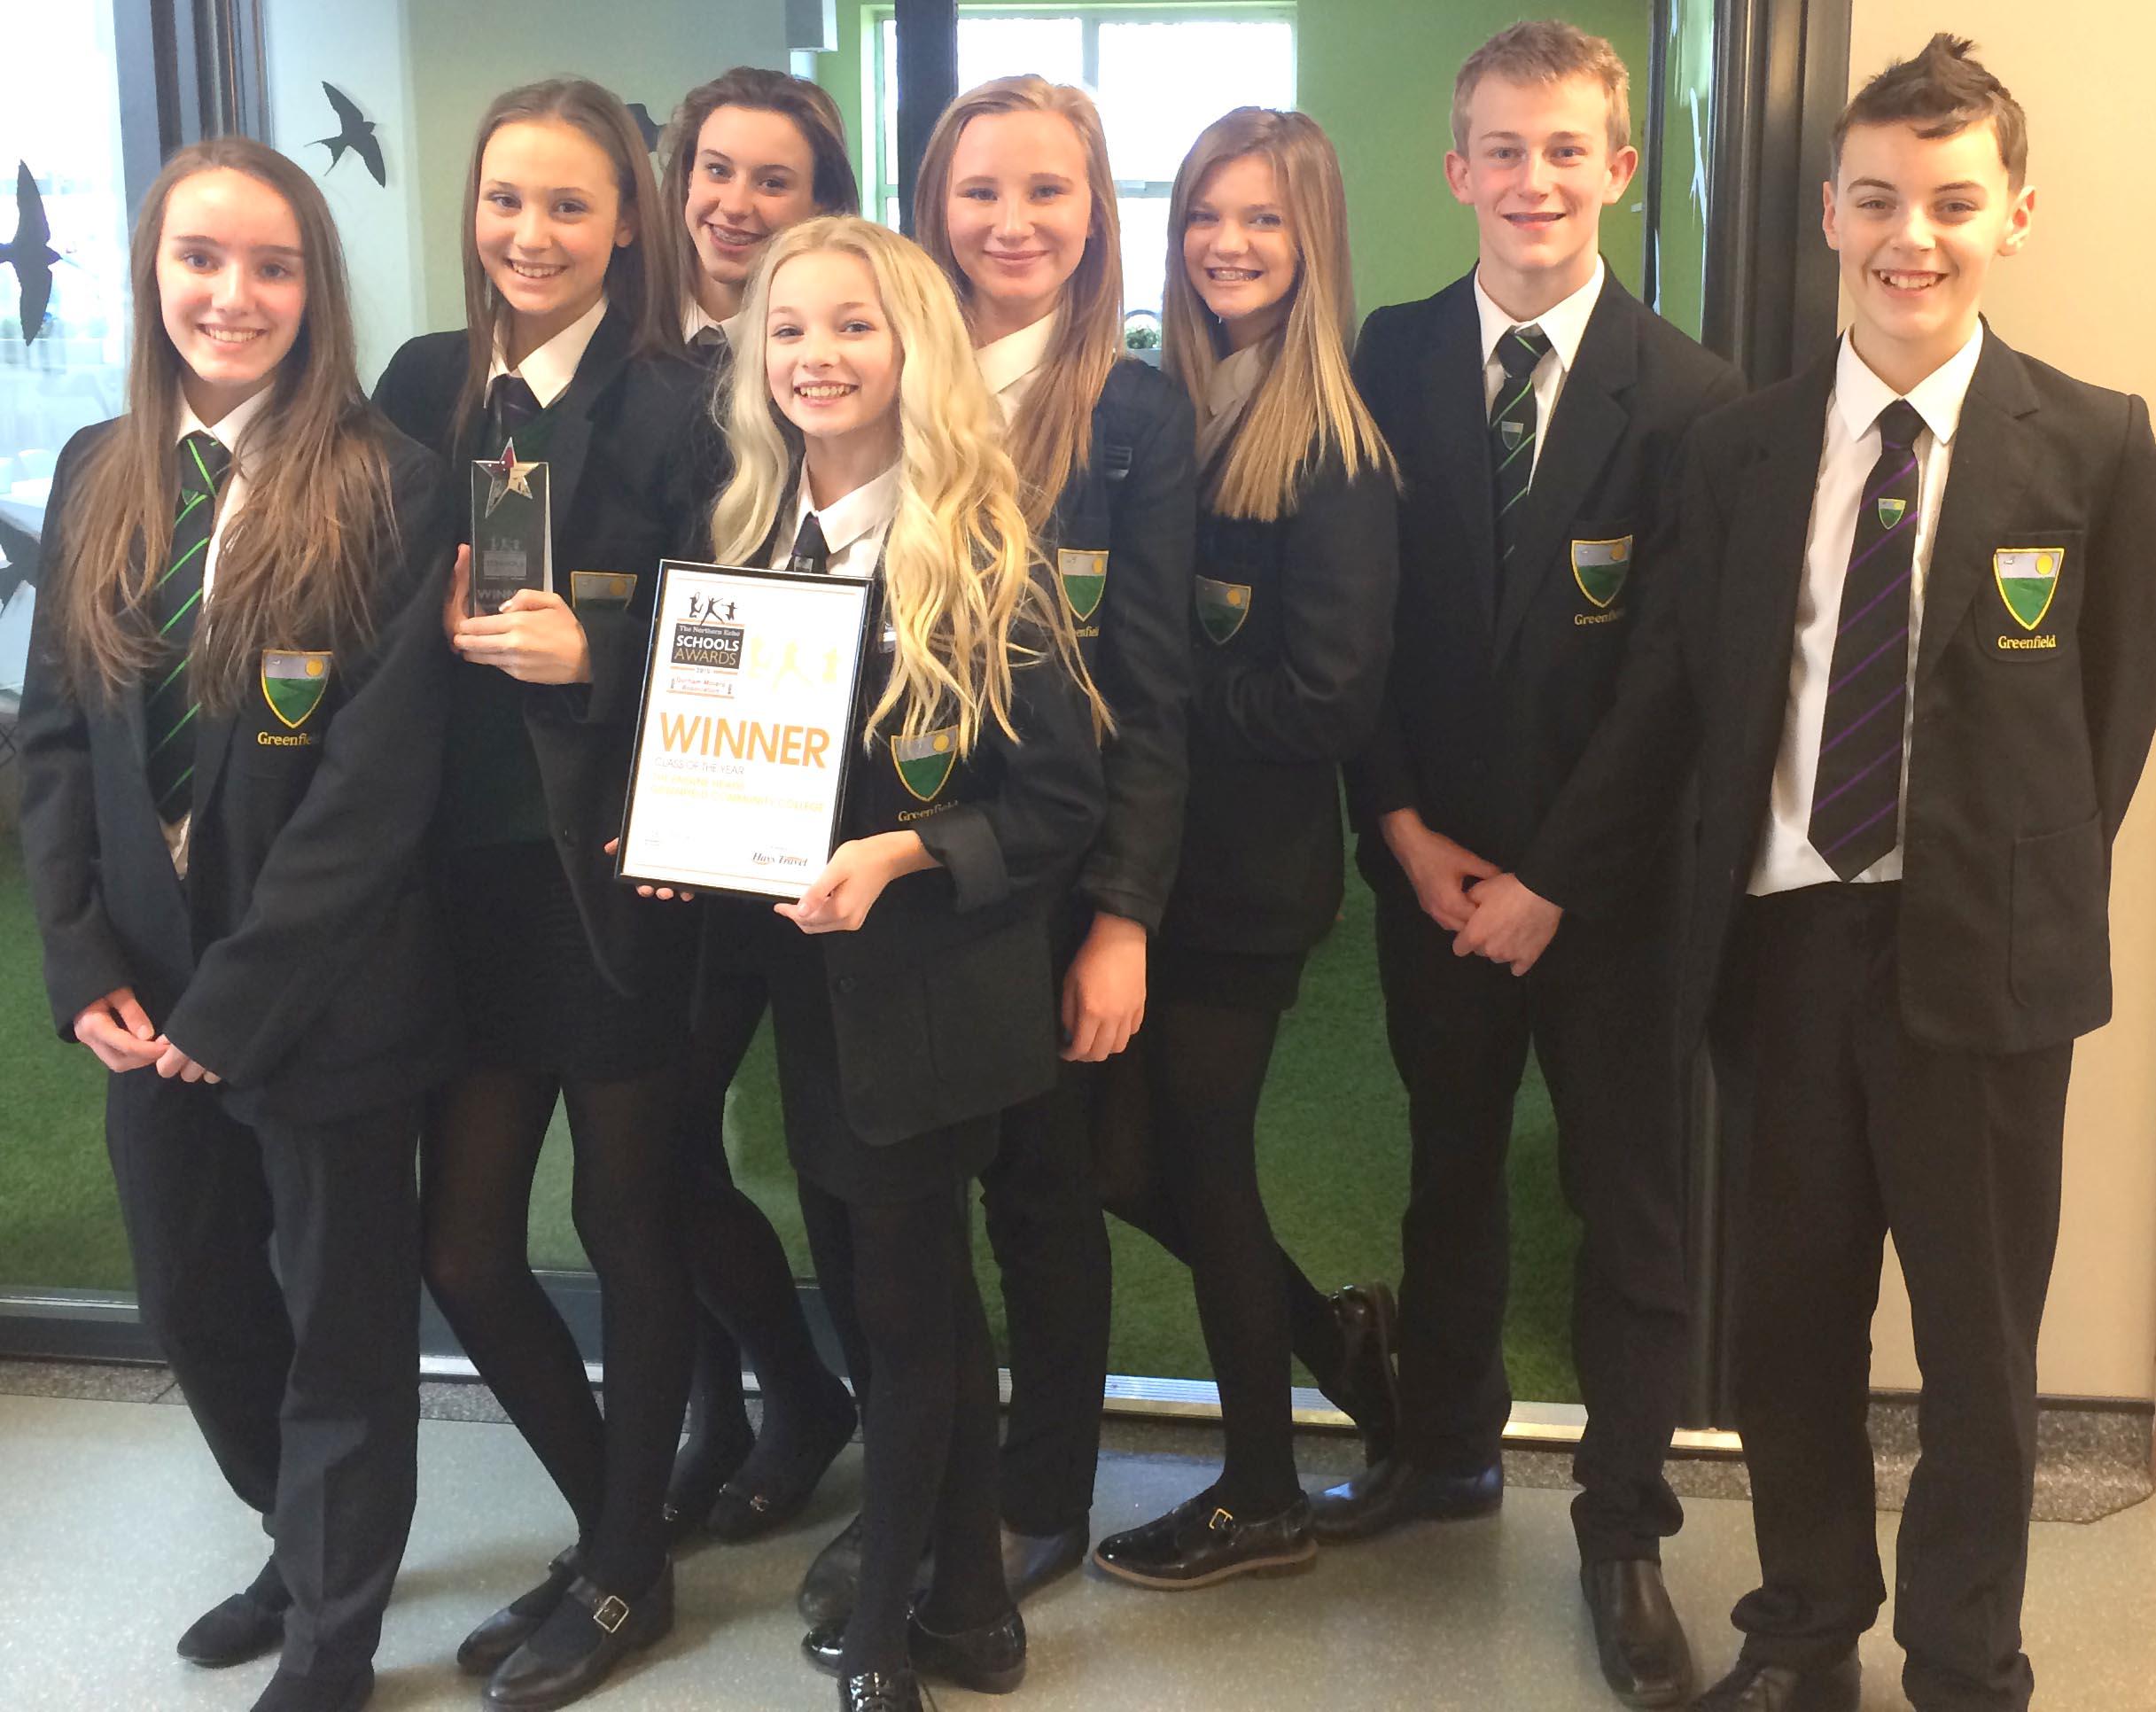 Regional Class of the Year Award